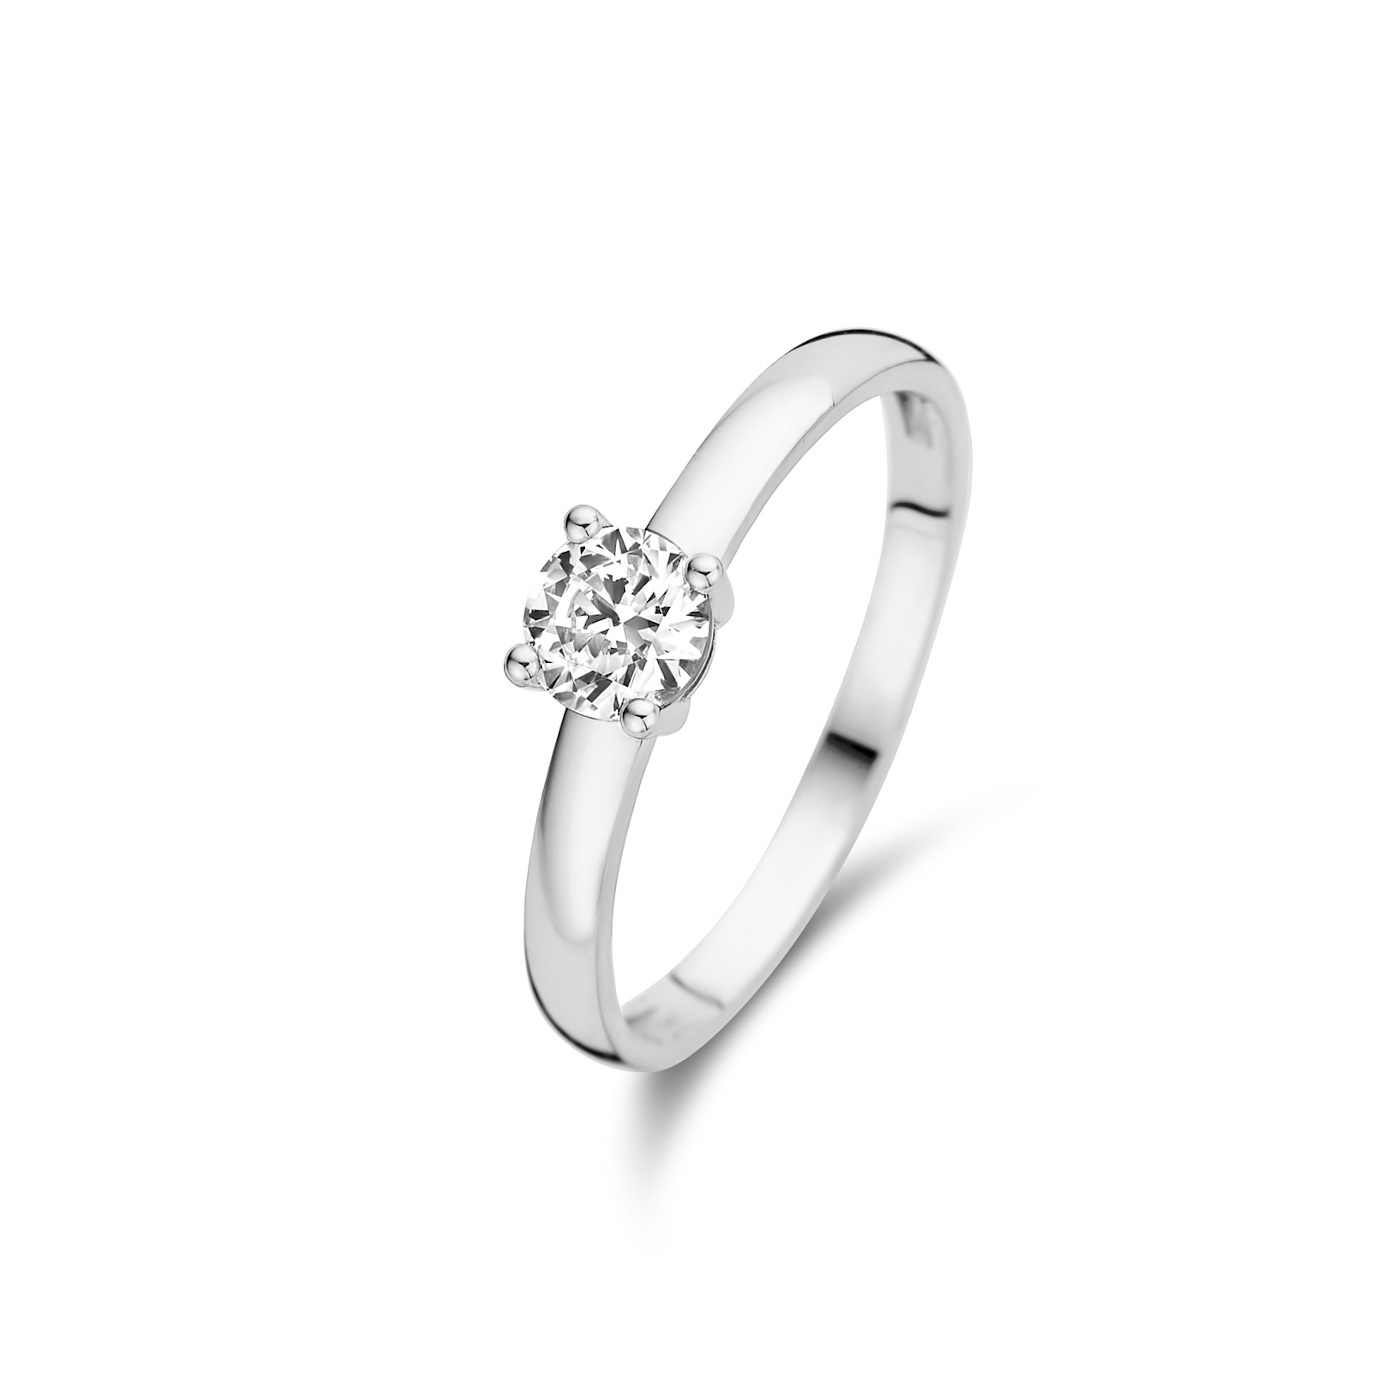 Isabel Bernard Saint Germain de Buci 14 carat white gold ring zirconia